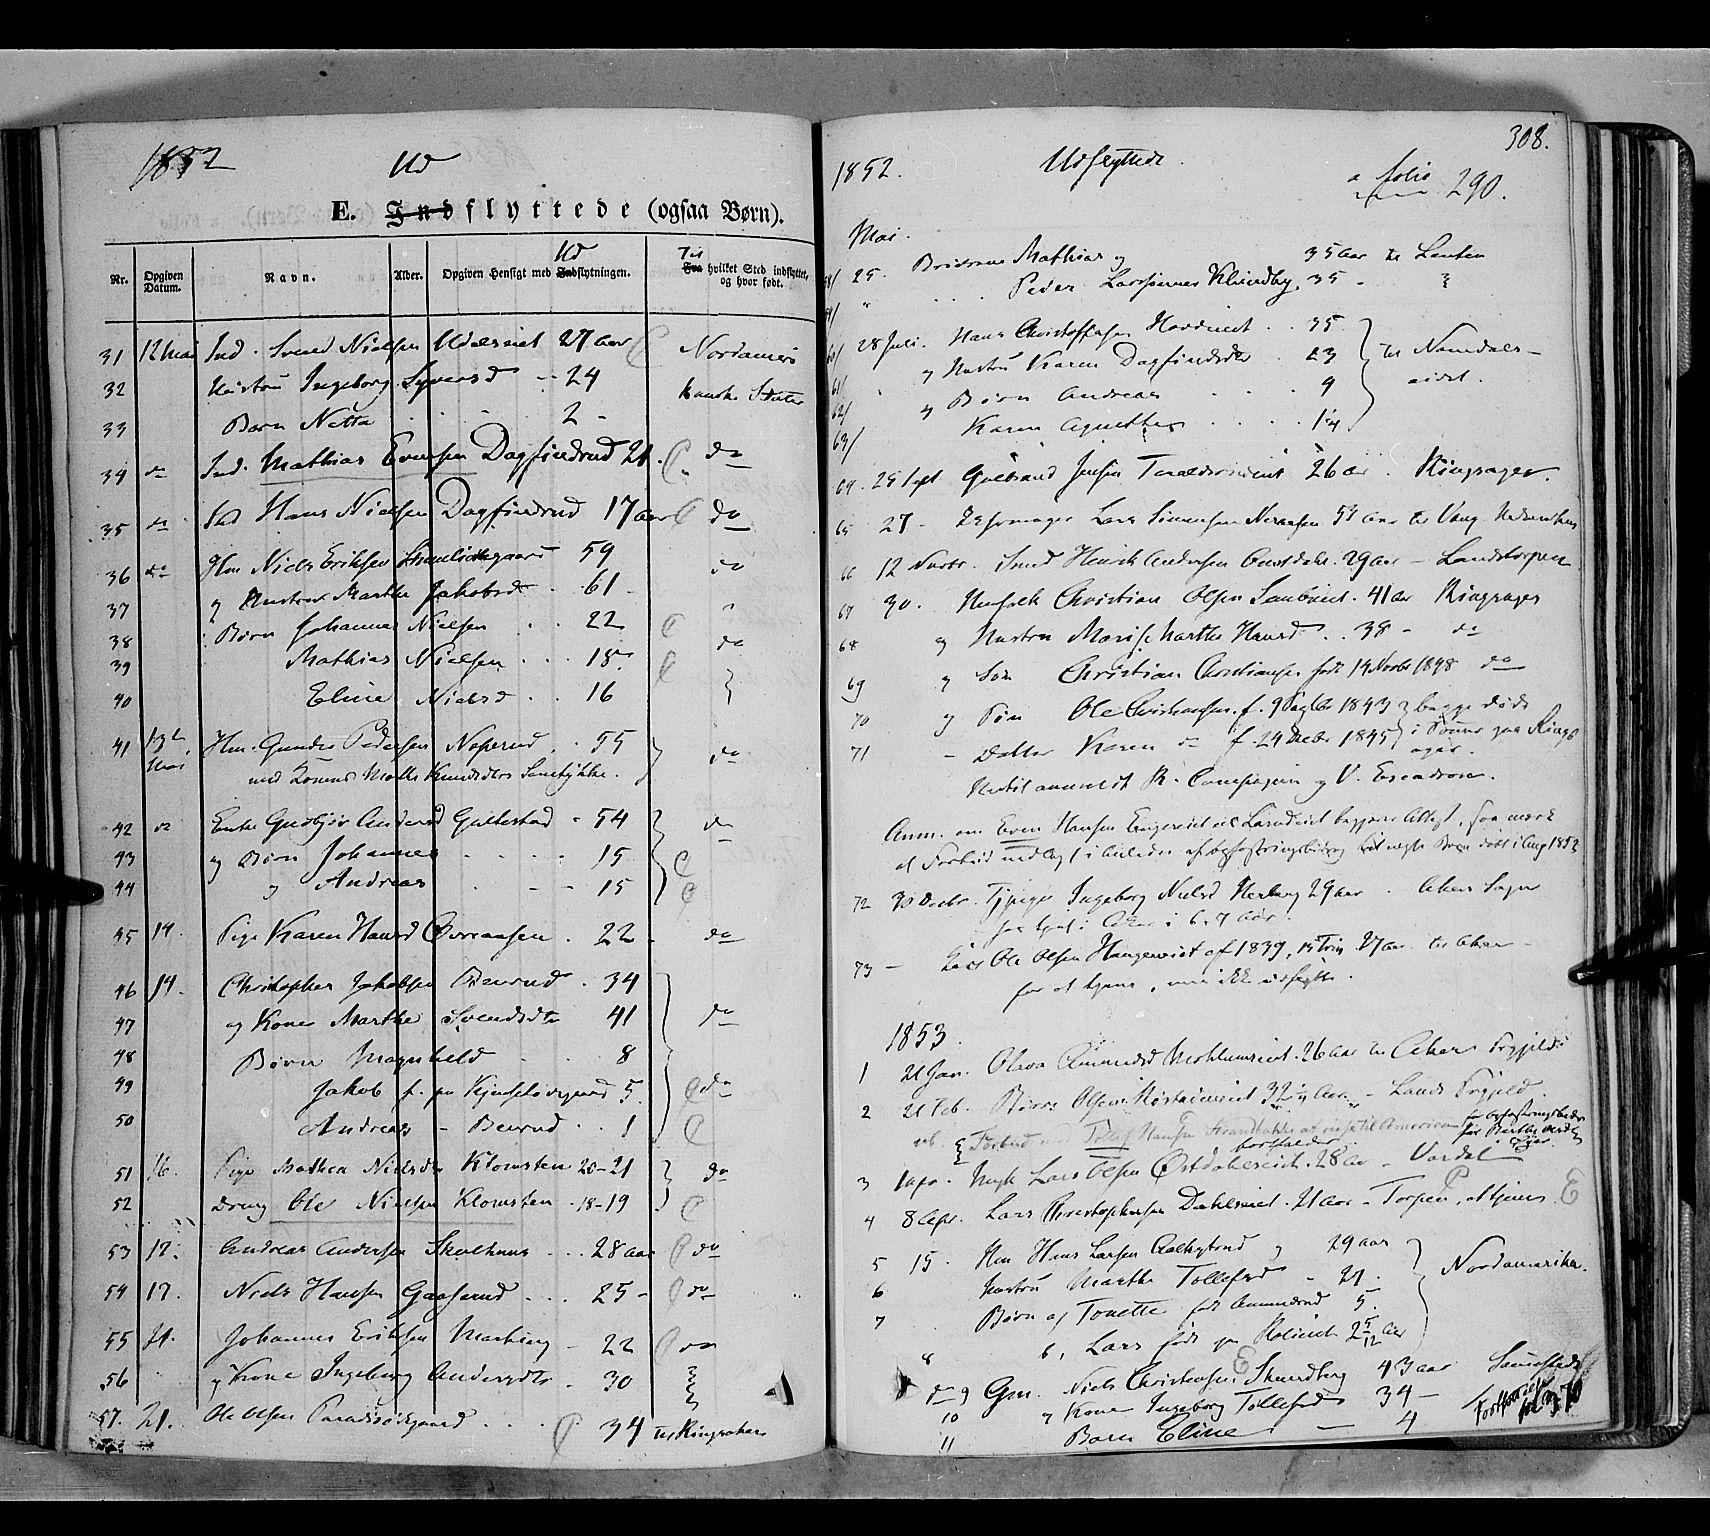 SAH, Biri prestekontor, Ministerialbok nr. 5, 1843-1854, s. 308